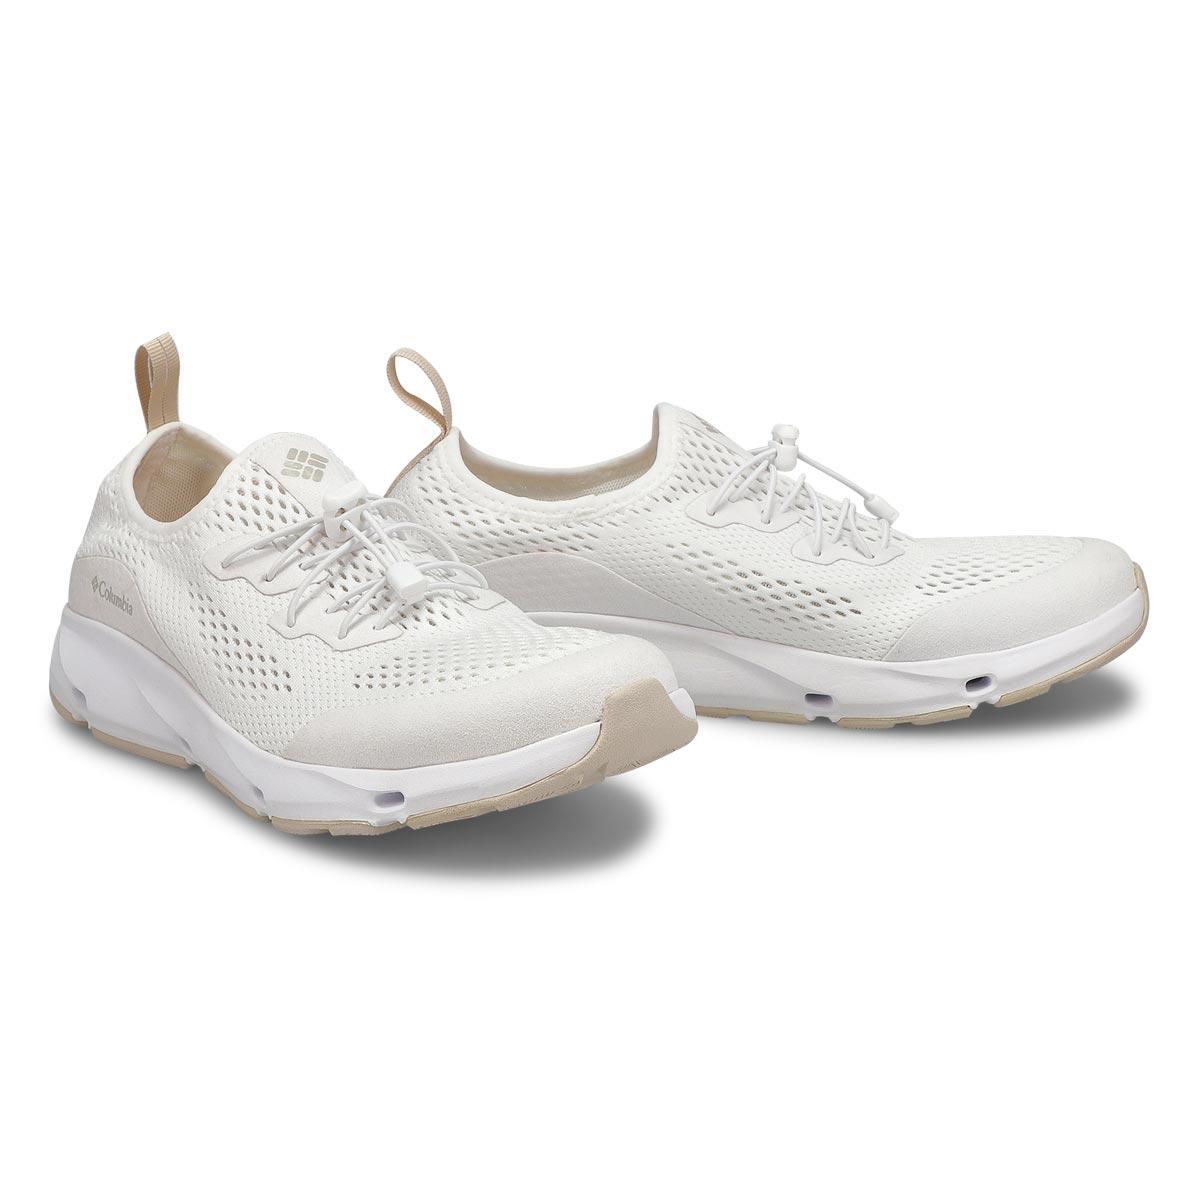 Lds Columbia Vent white fashion sneaker